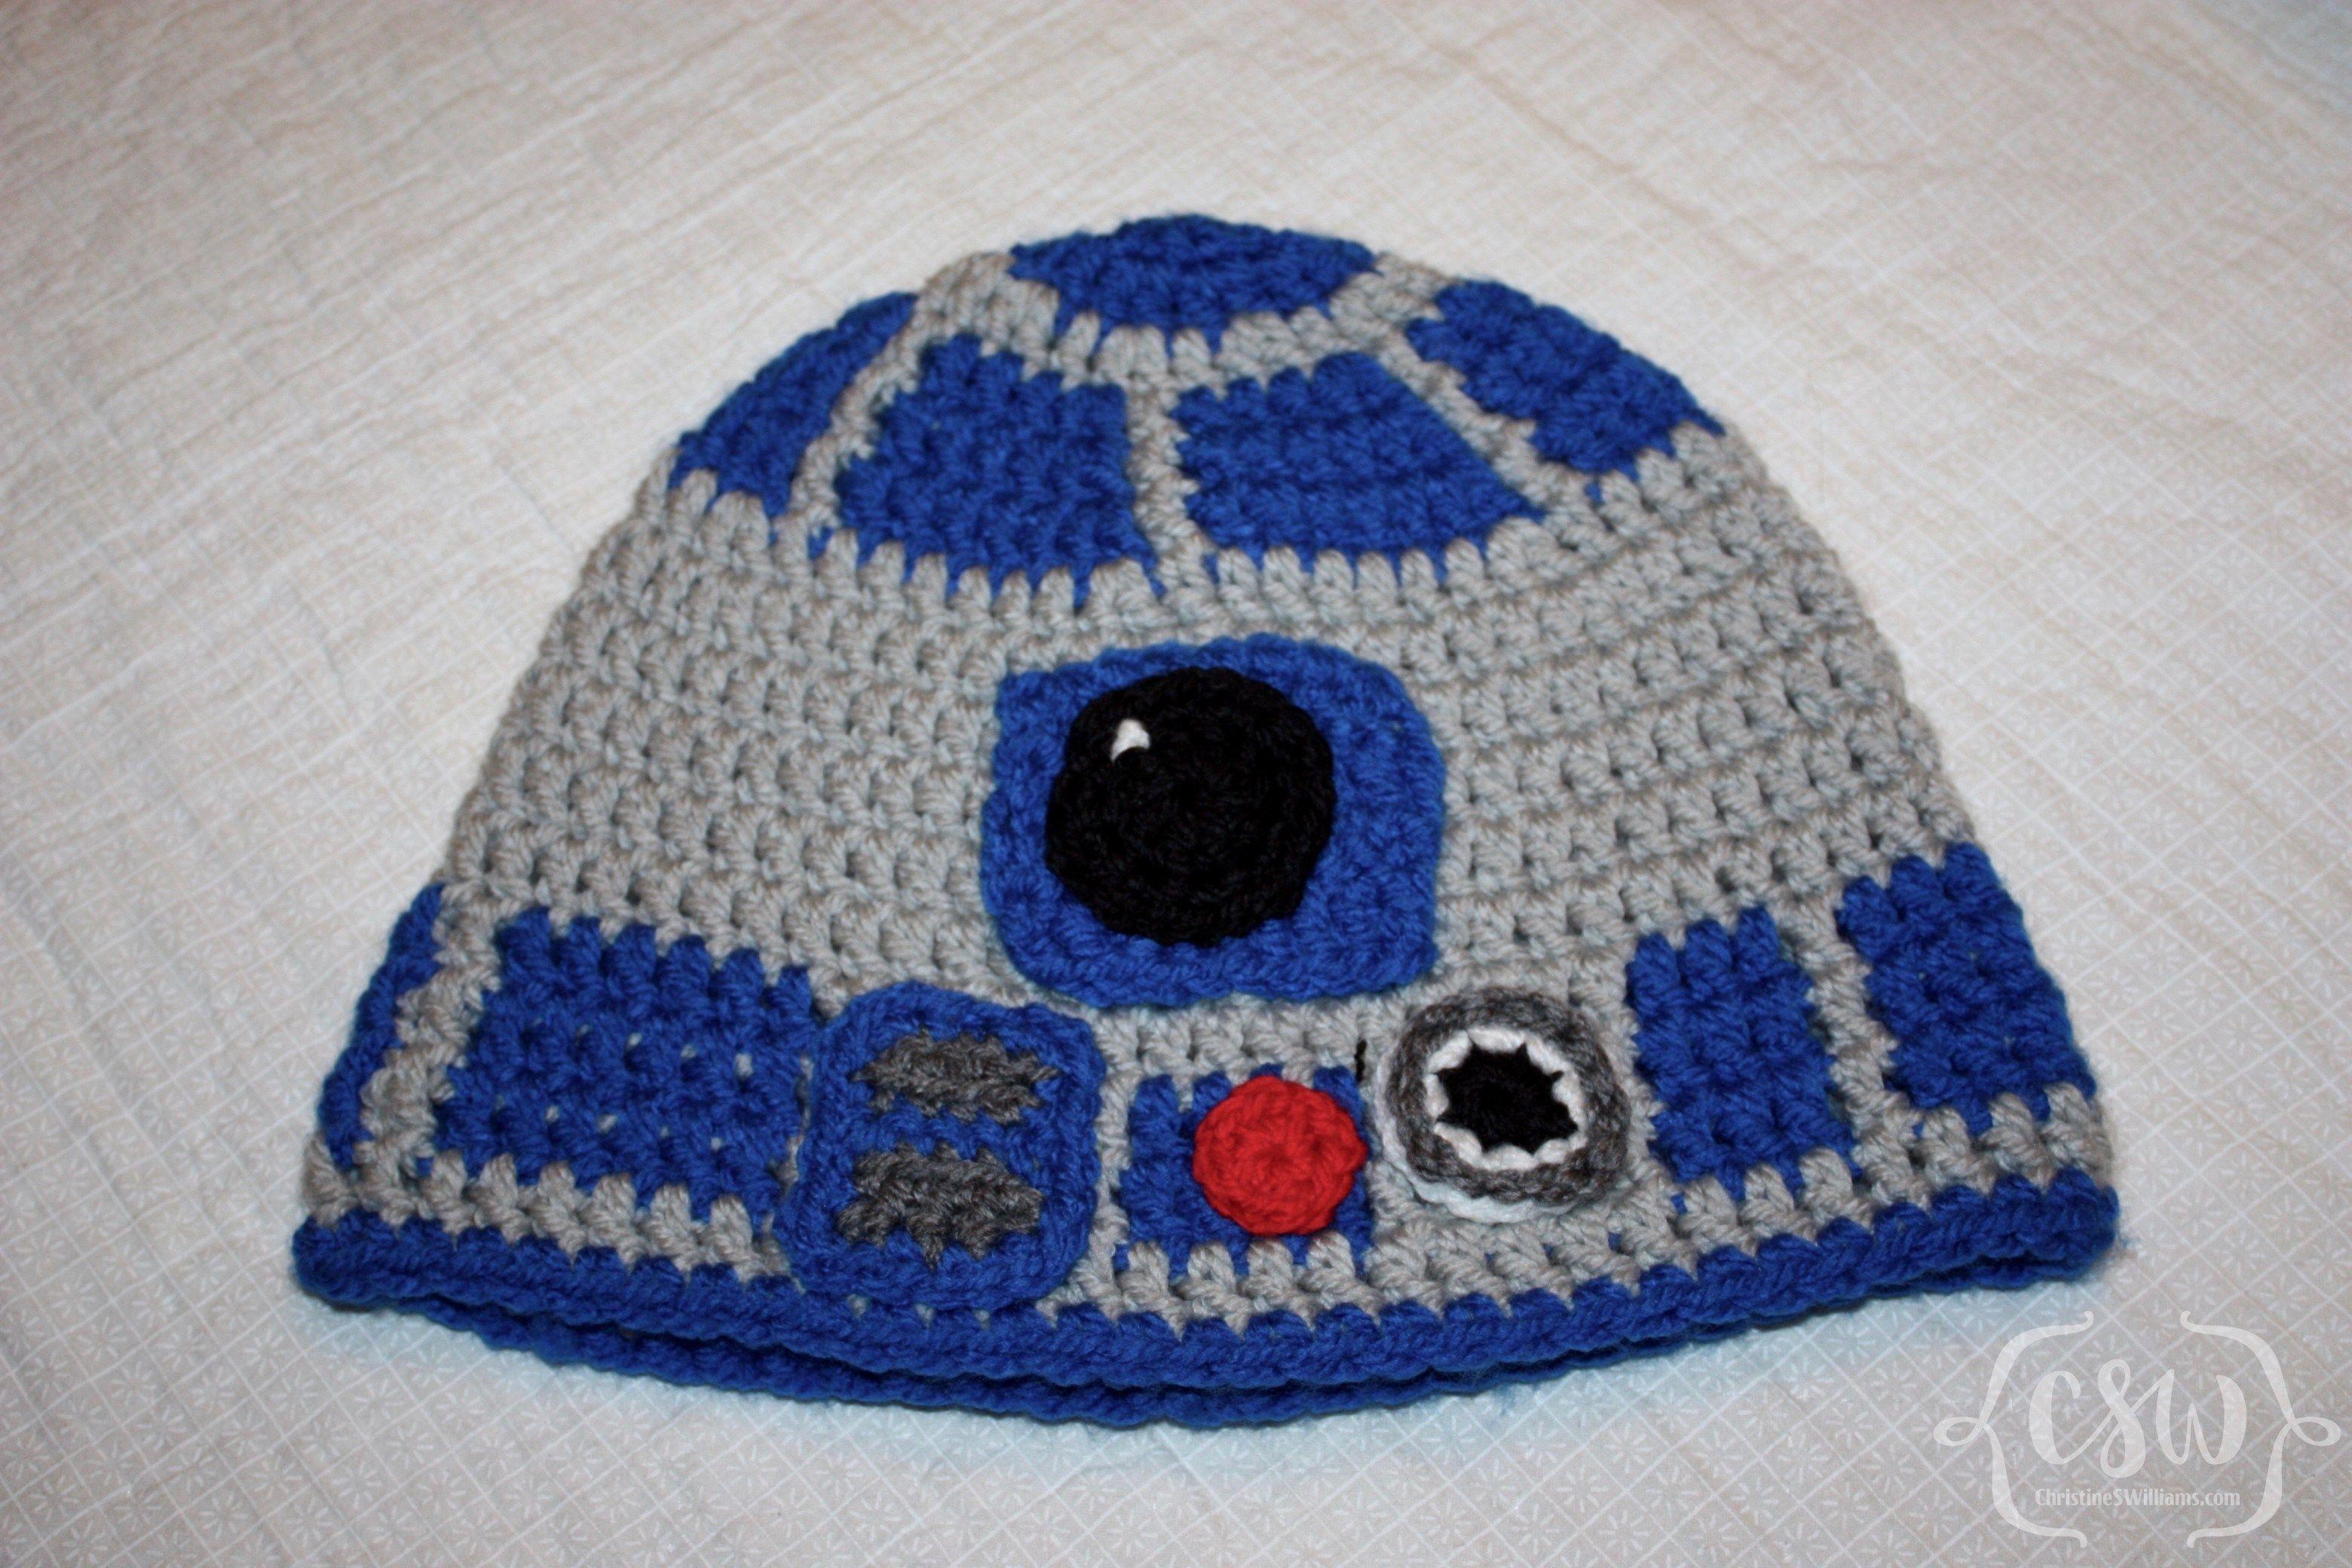 R2D2 Hat | Crochet crafts, Crochet and Free crochet